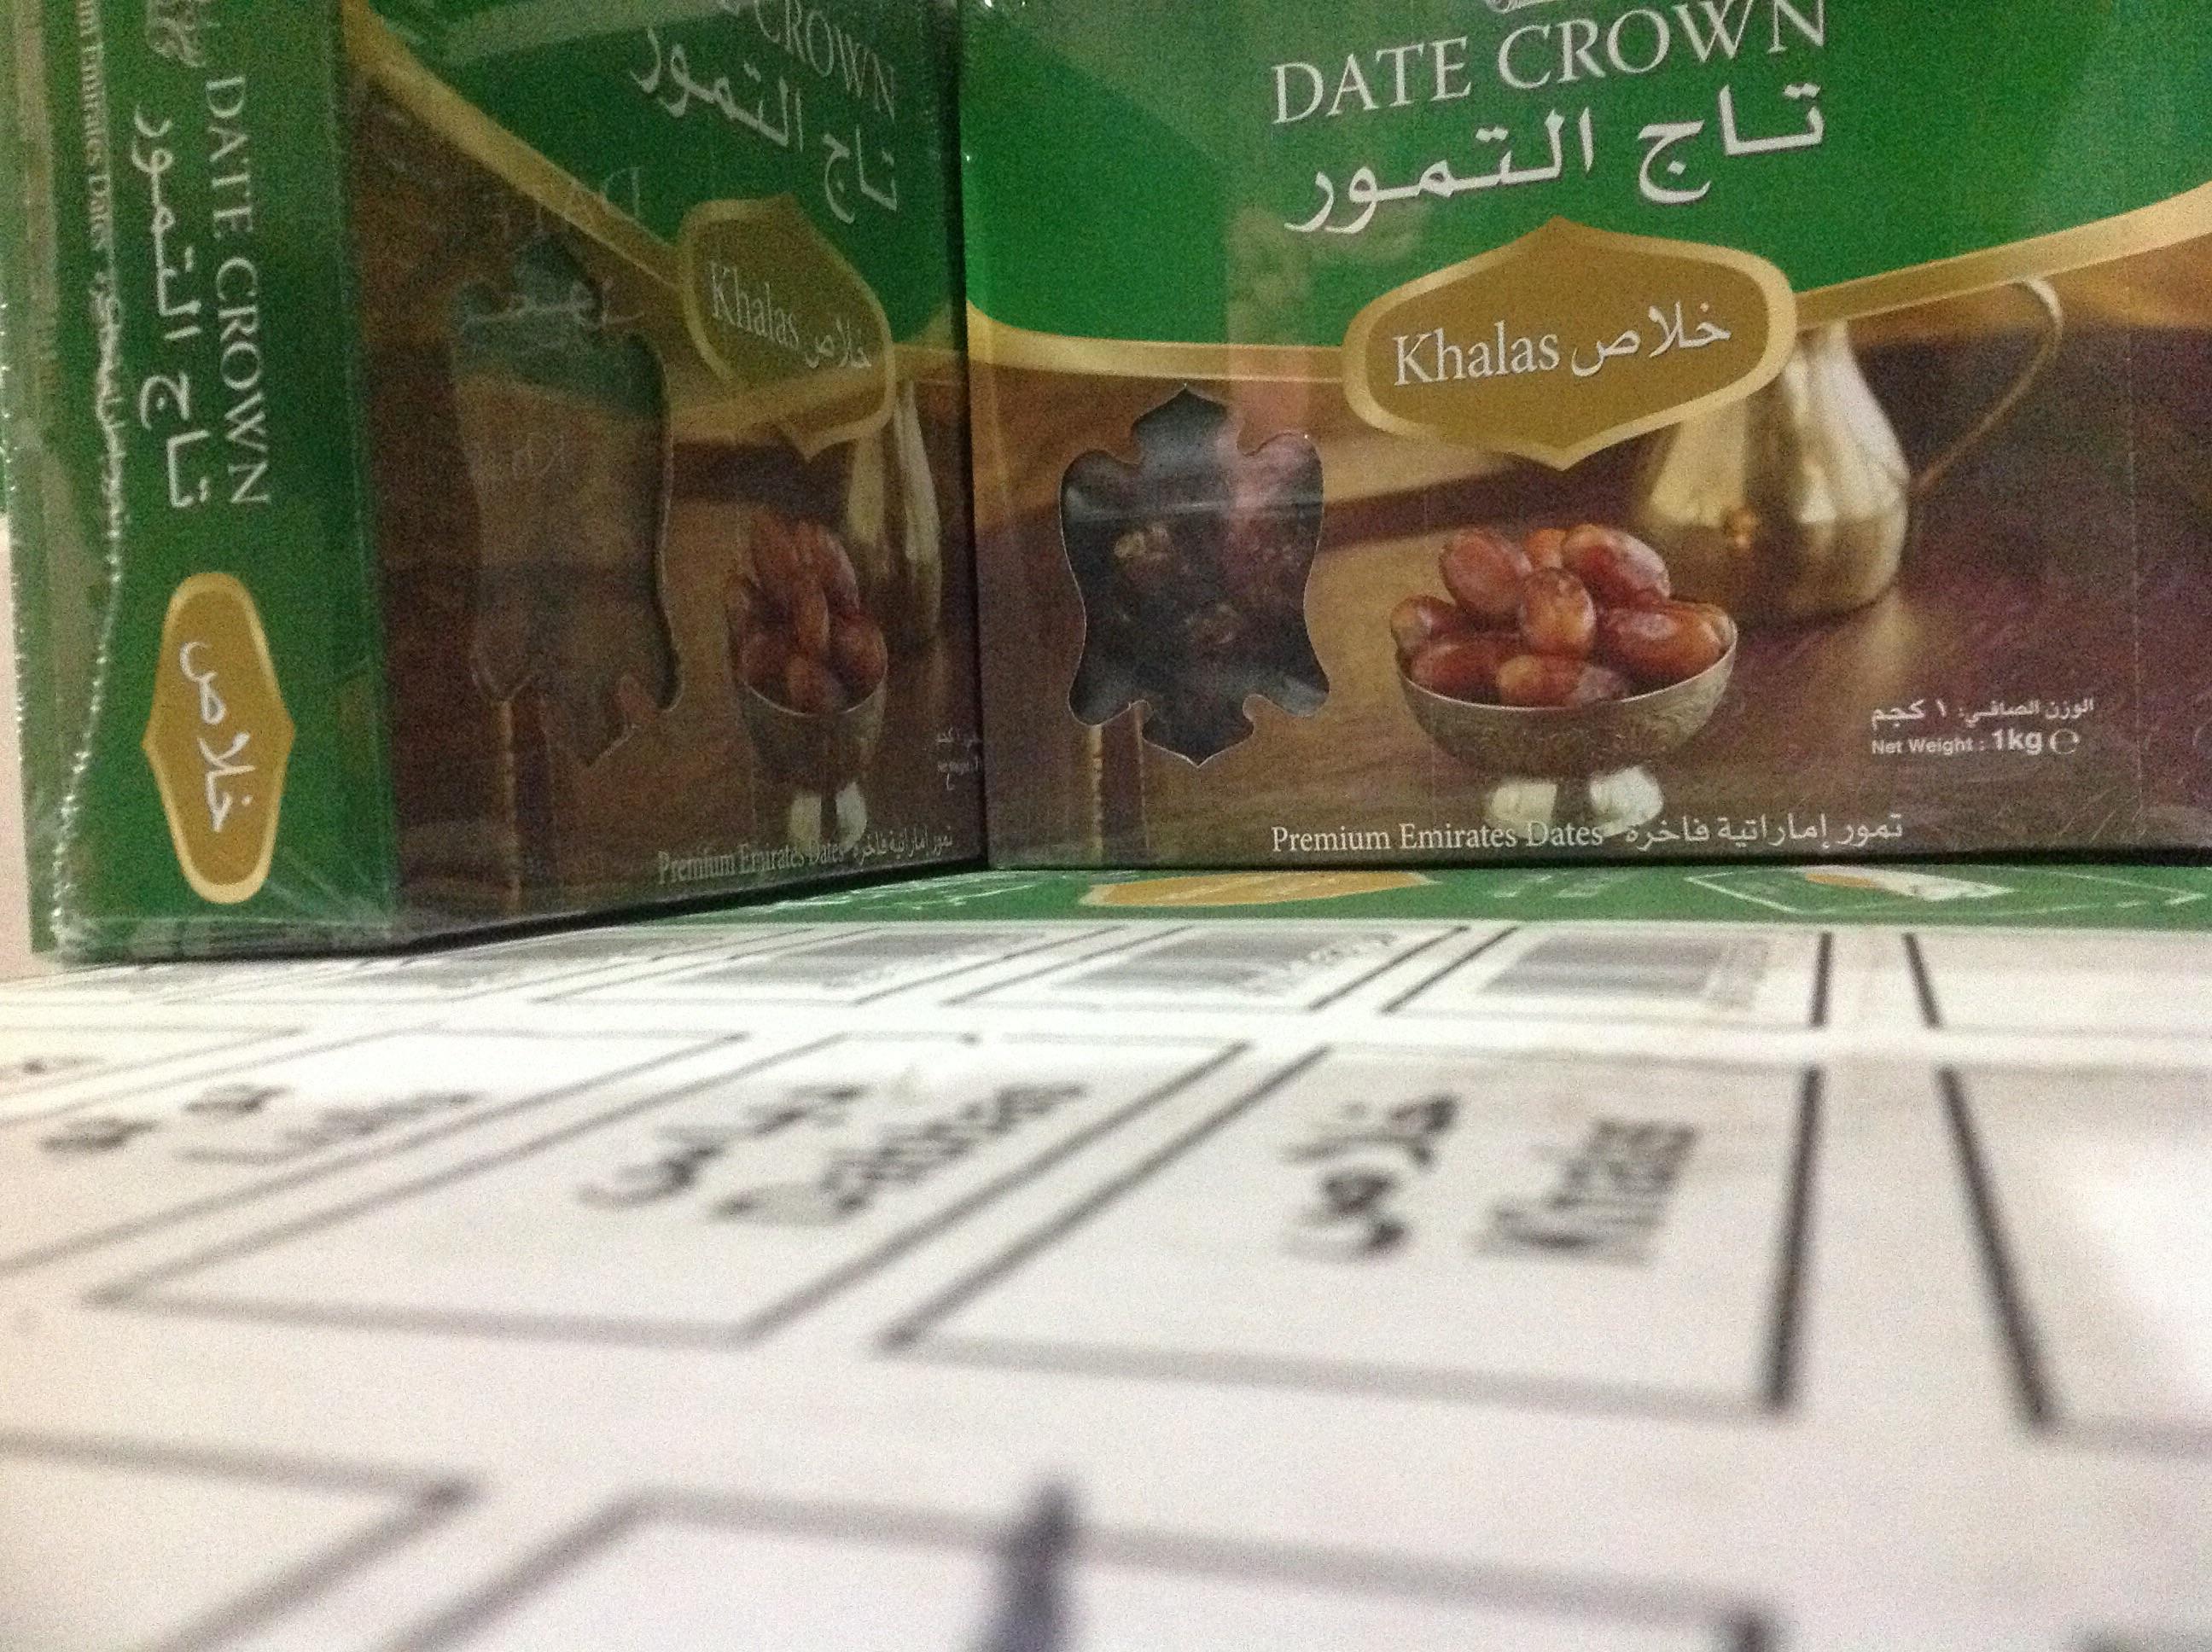 Kurma Kheinaizi Dan Khalas Jual Roti Maryam Harga Date Crown 1kg Ready Stock Isi 1 Kg Rp 60000 Pack Emirat